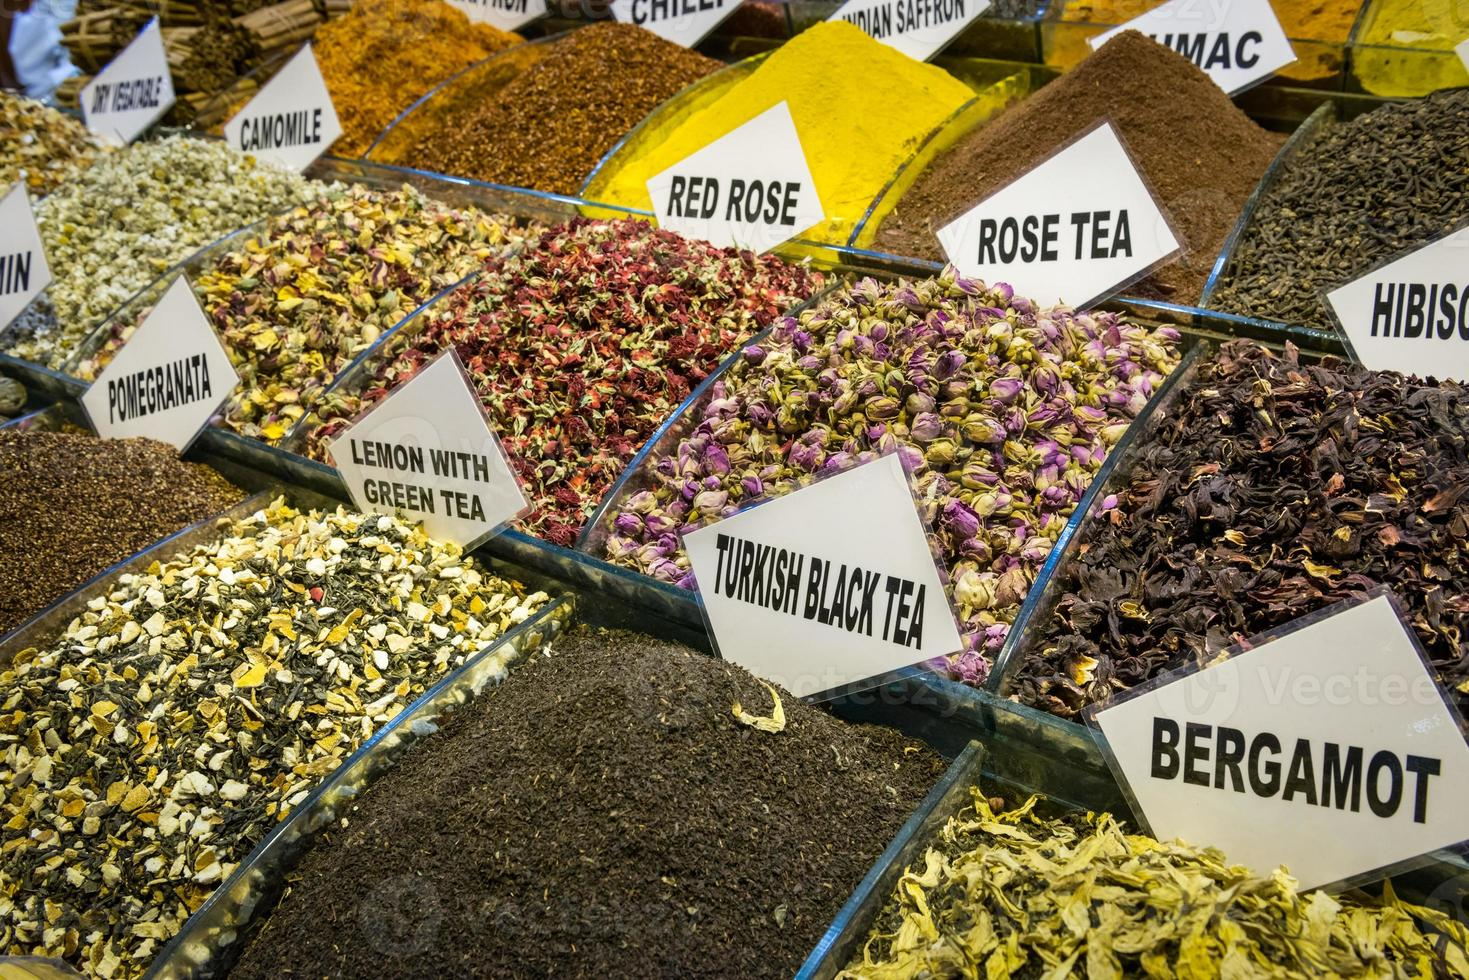 bazar turco foto